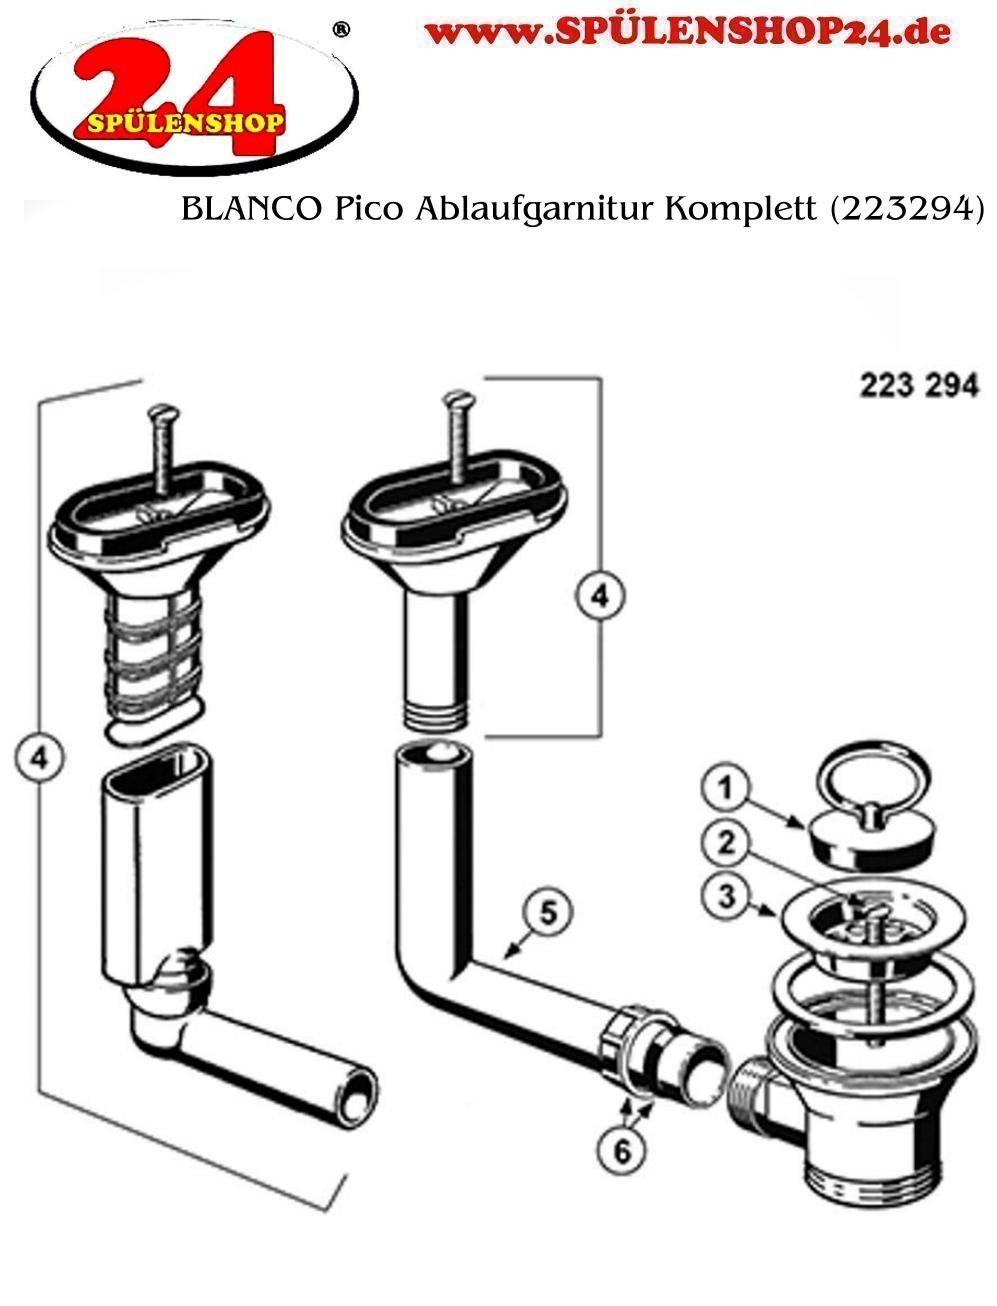 Blanco Pico Ablaufgarnitur Komplett 223294 Kaufen